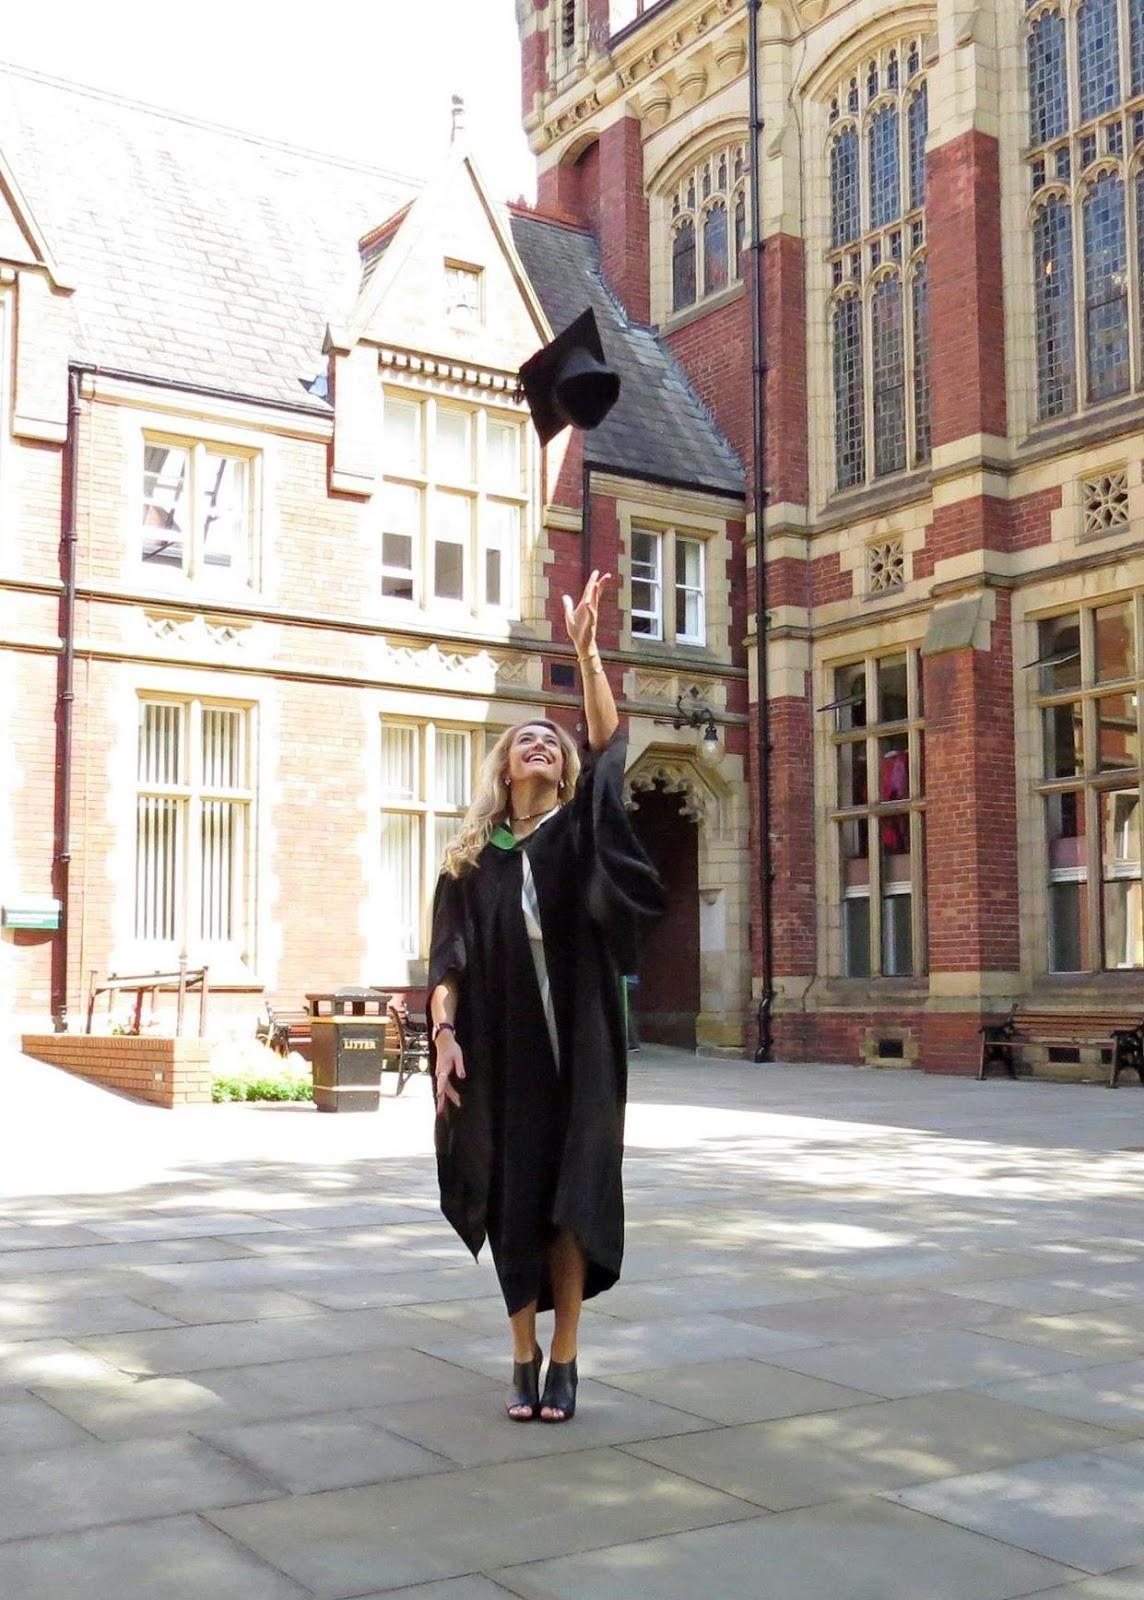 Graduating at the University of Leeds